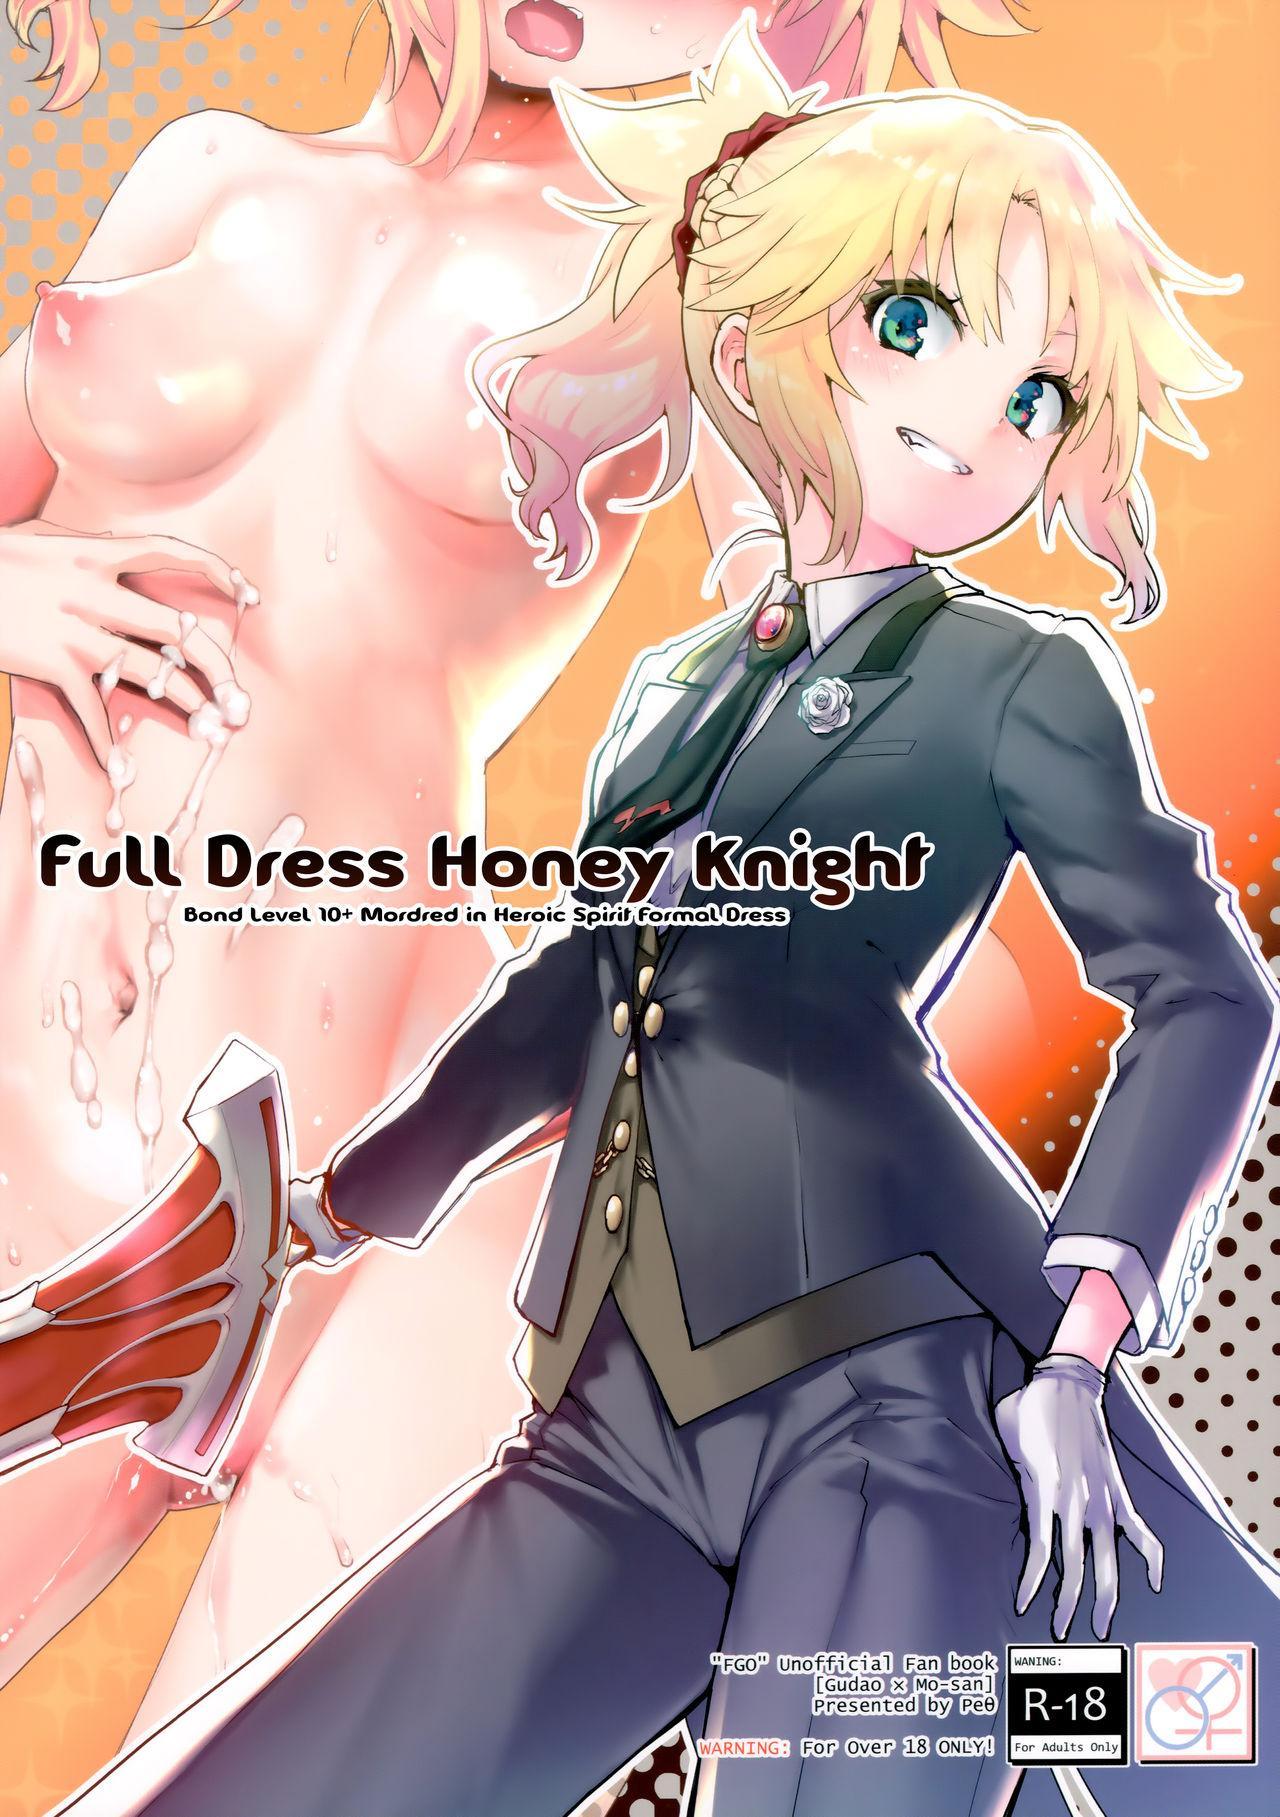 (COMIC1☆16) [Peθ (Mozu)] Full Dress Honey Knight -Kizuna10+ no Mor-san to Eirei Seisou- (Fate/Grand Order) [English] [EHCOVE] 0